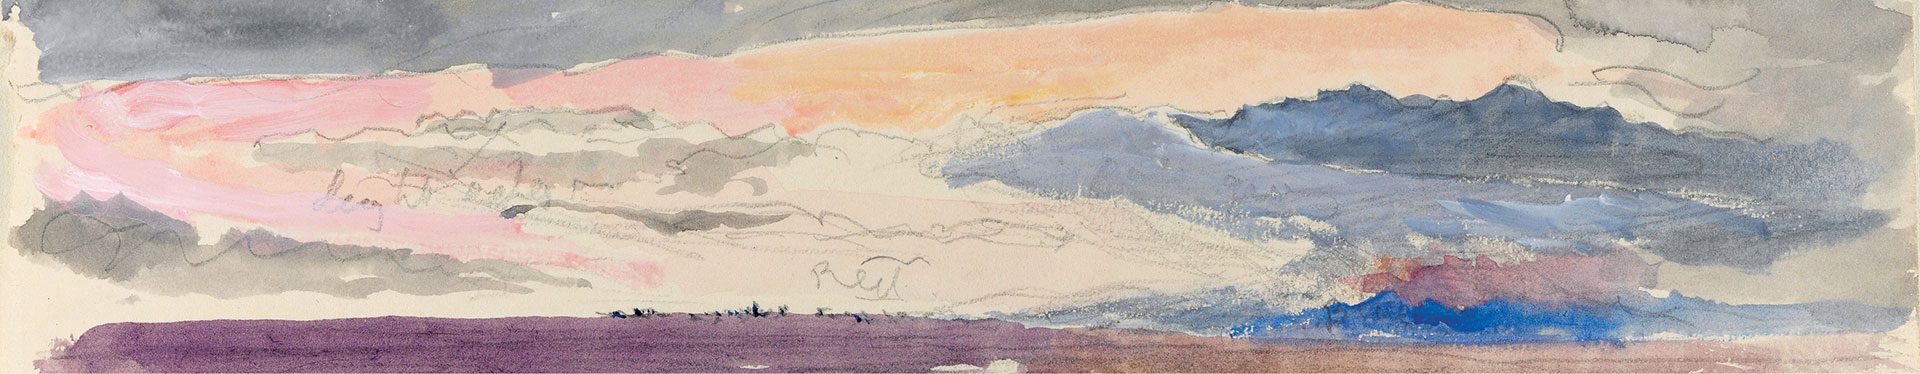 British-Art-on-Paper-1600-1850-banner-FINAL_101_1_20170104114100.jpg